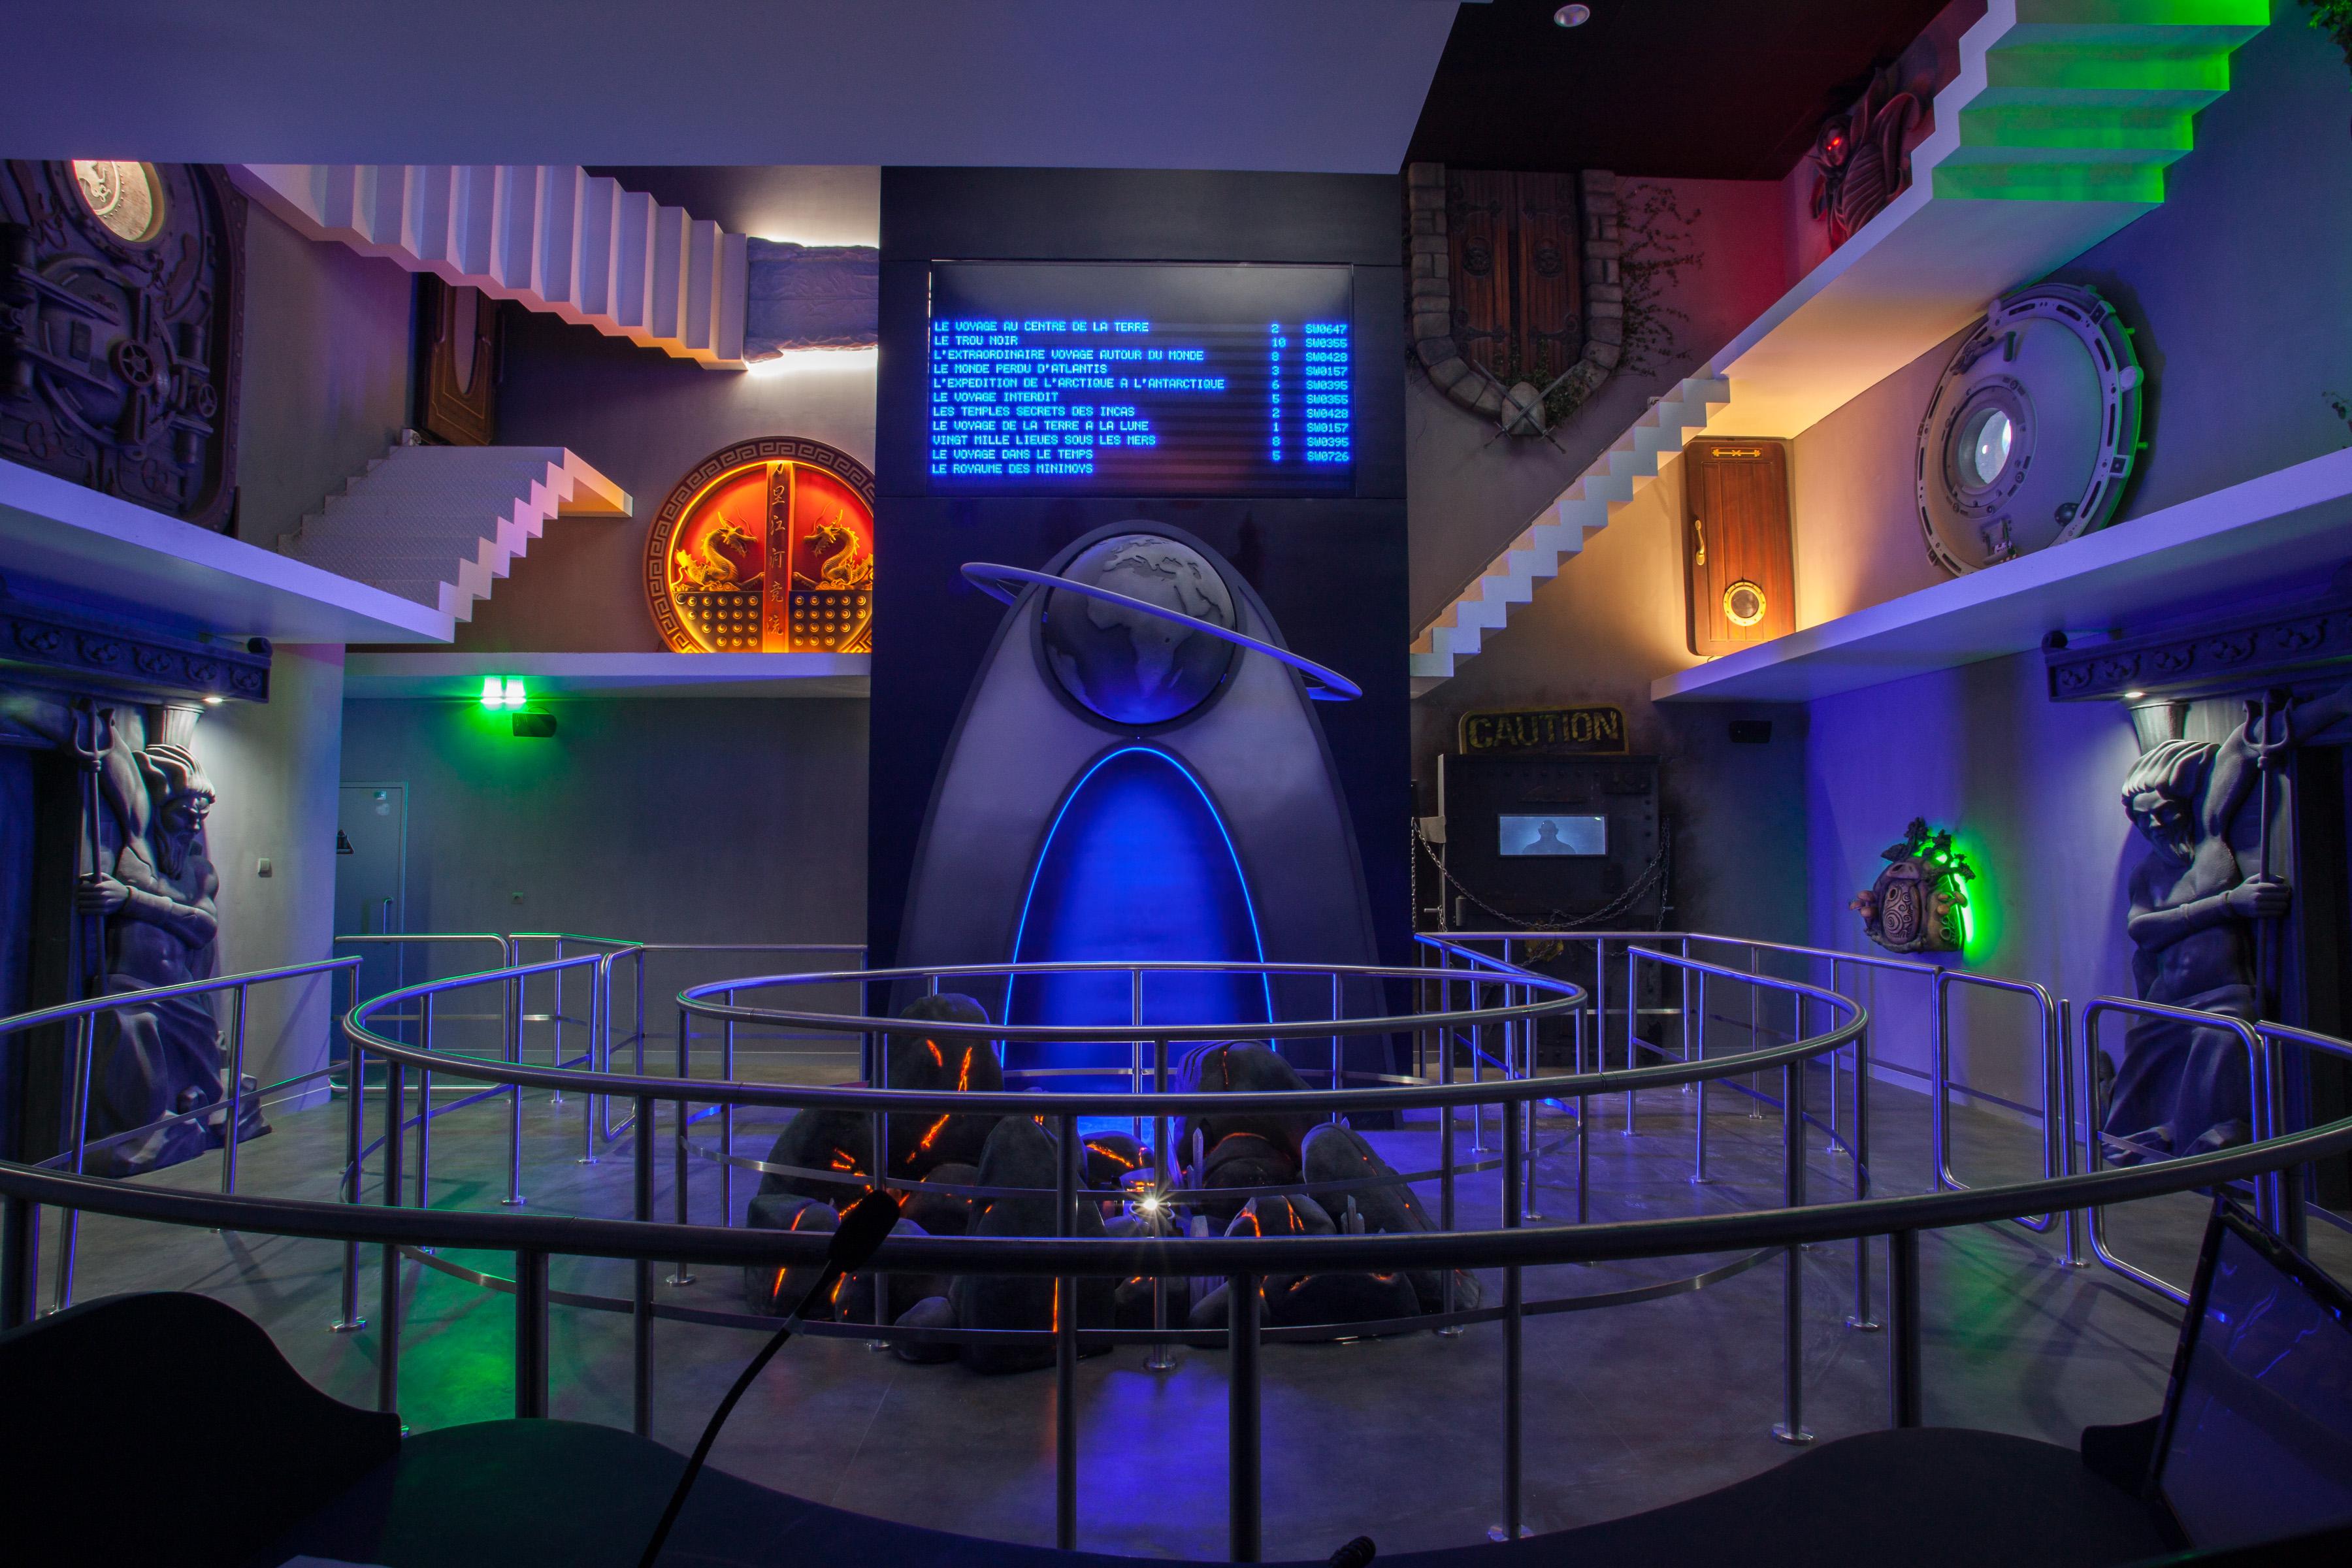 Futuroscope l 39 extraordinaire voyage 17 d cembre 2016 for Cid special bureau episode 13